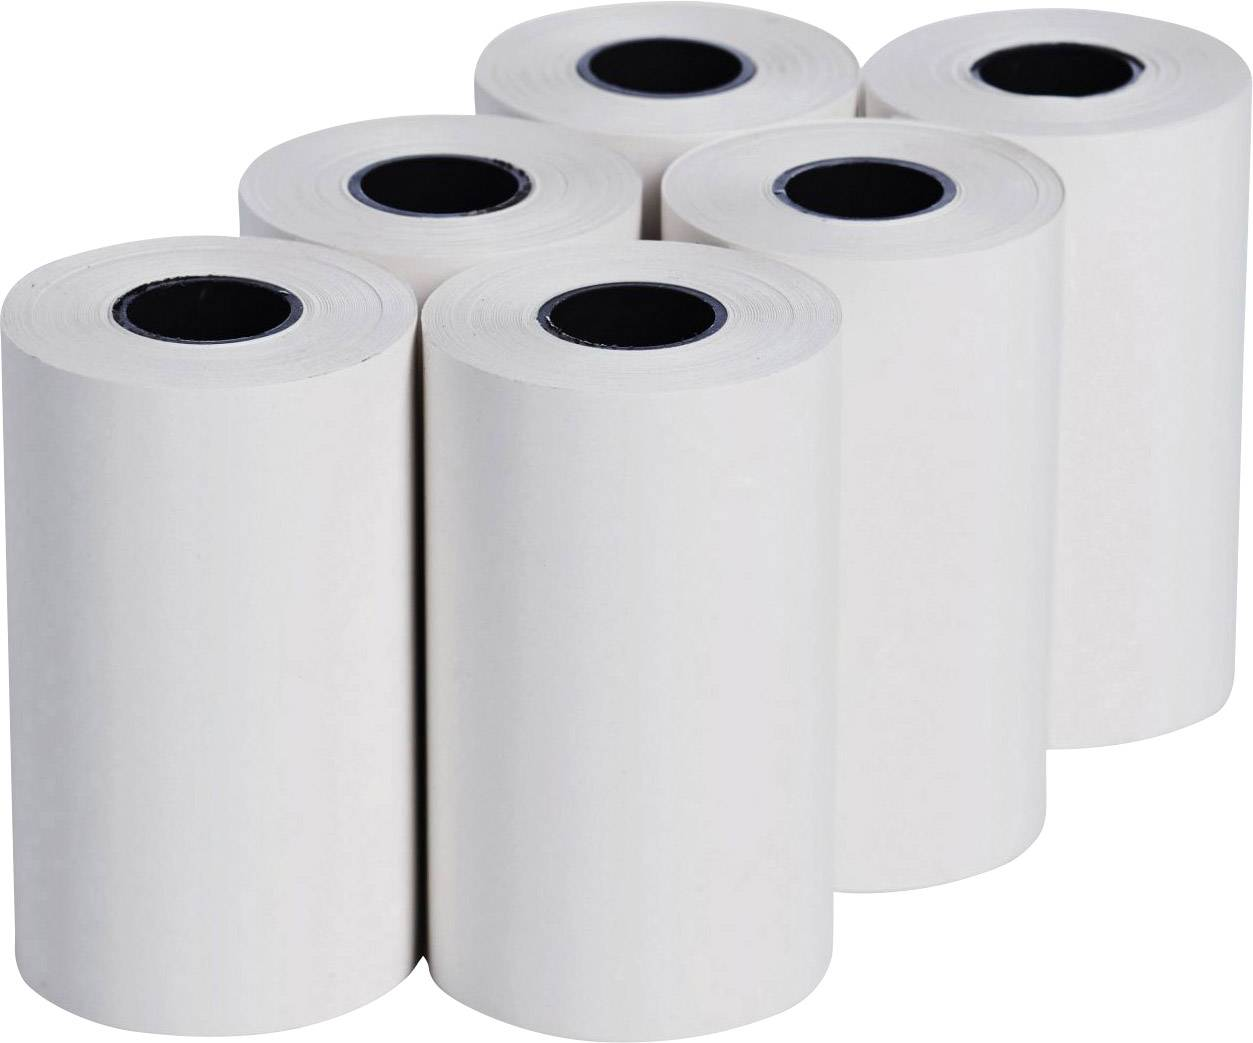 Termopapír testo, 0554 0568, pro bezdrátovou tiskárnu testo